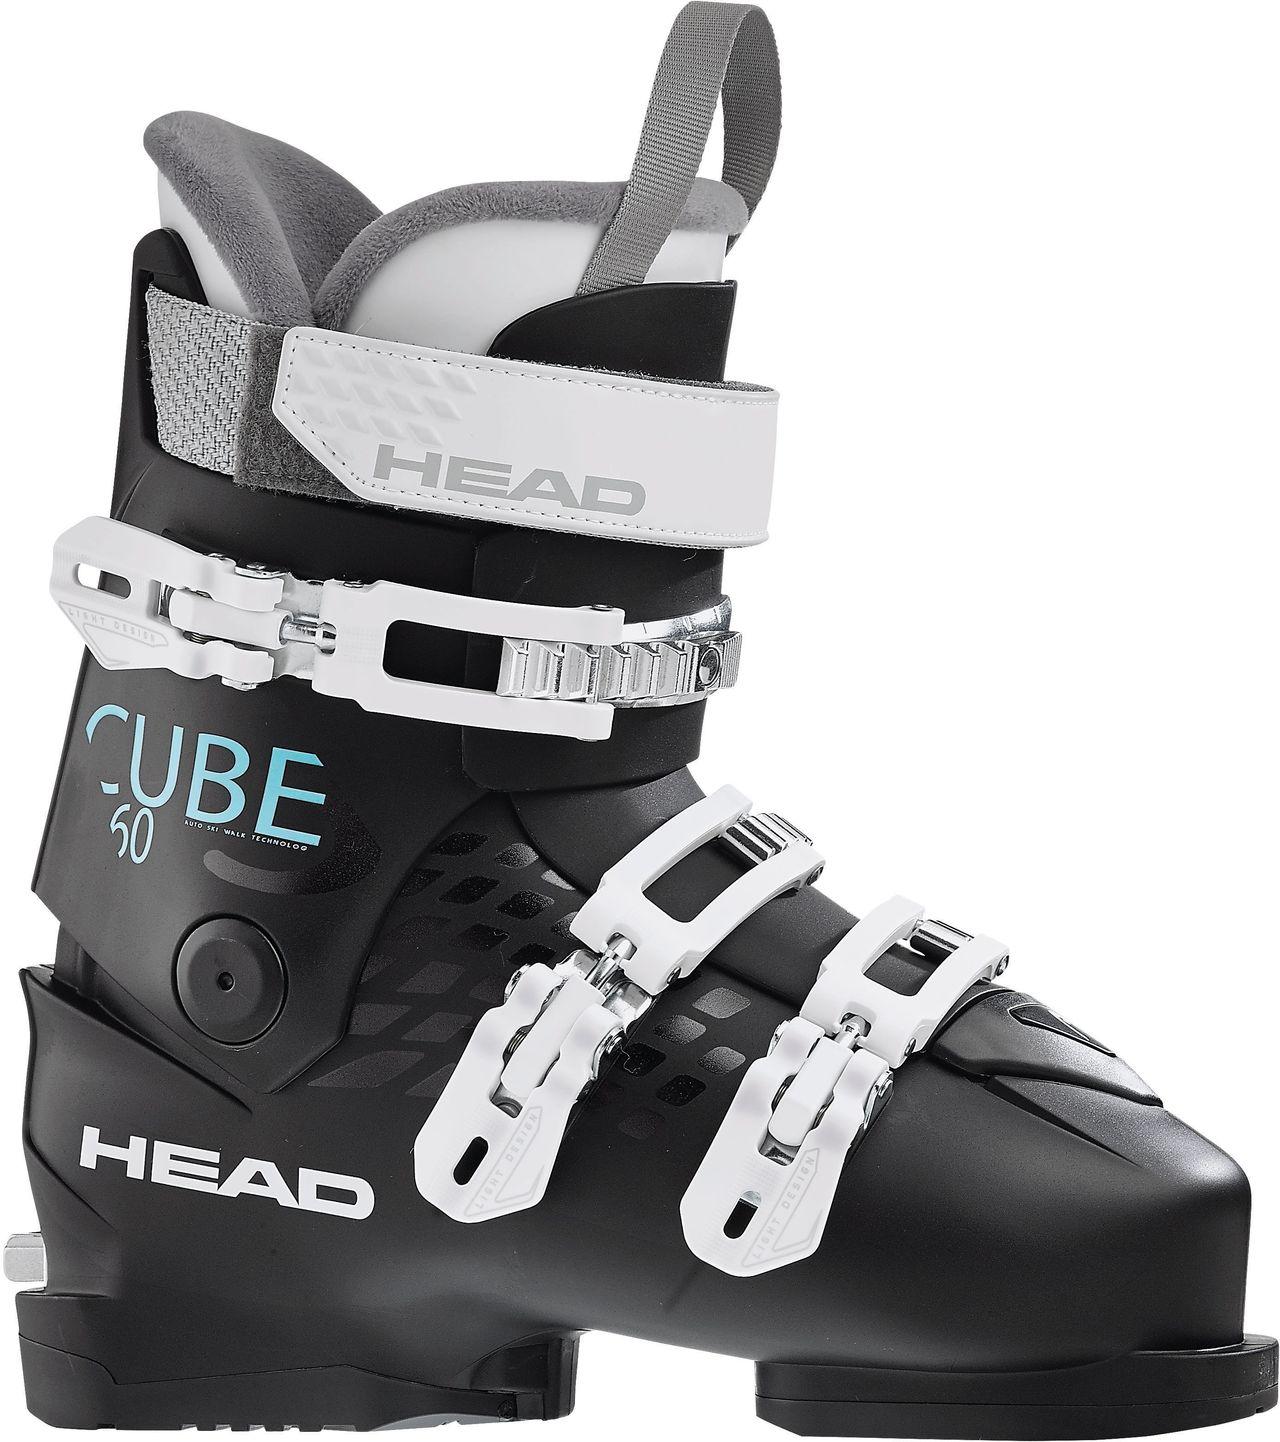 CUBE3 60